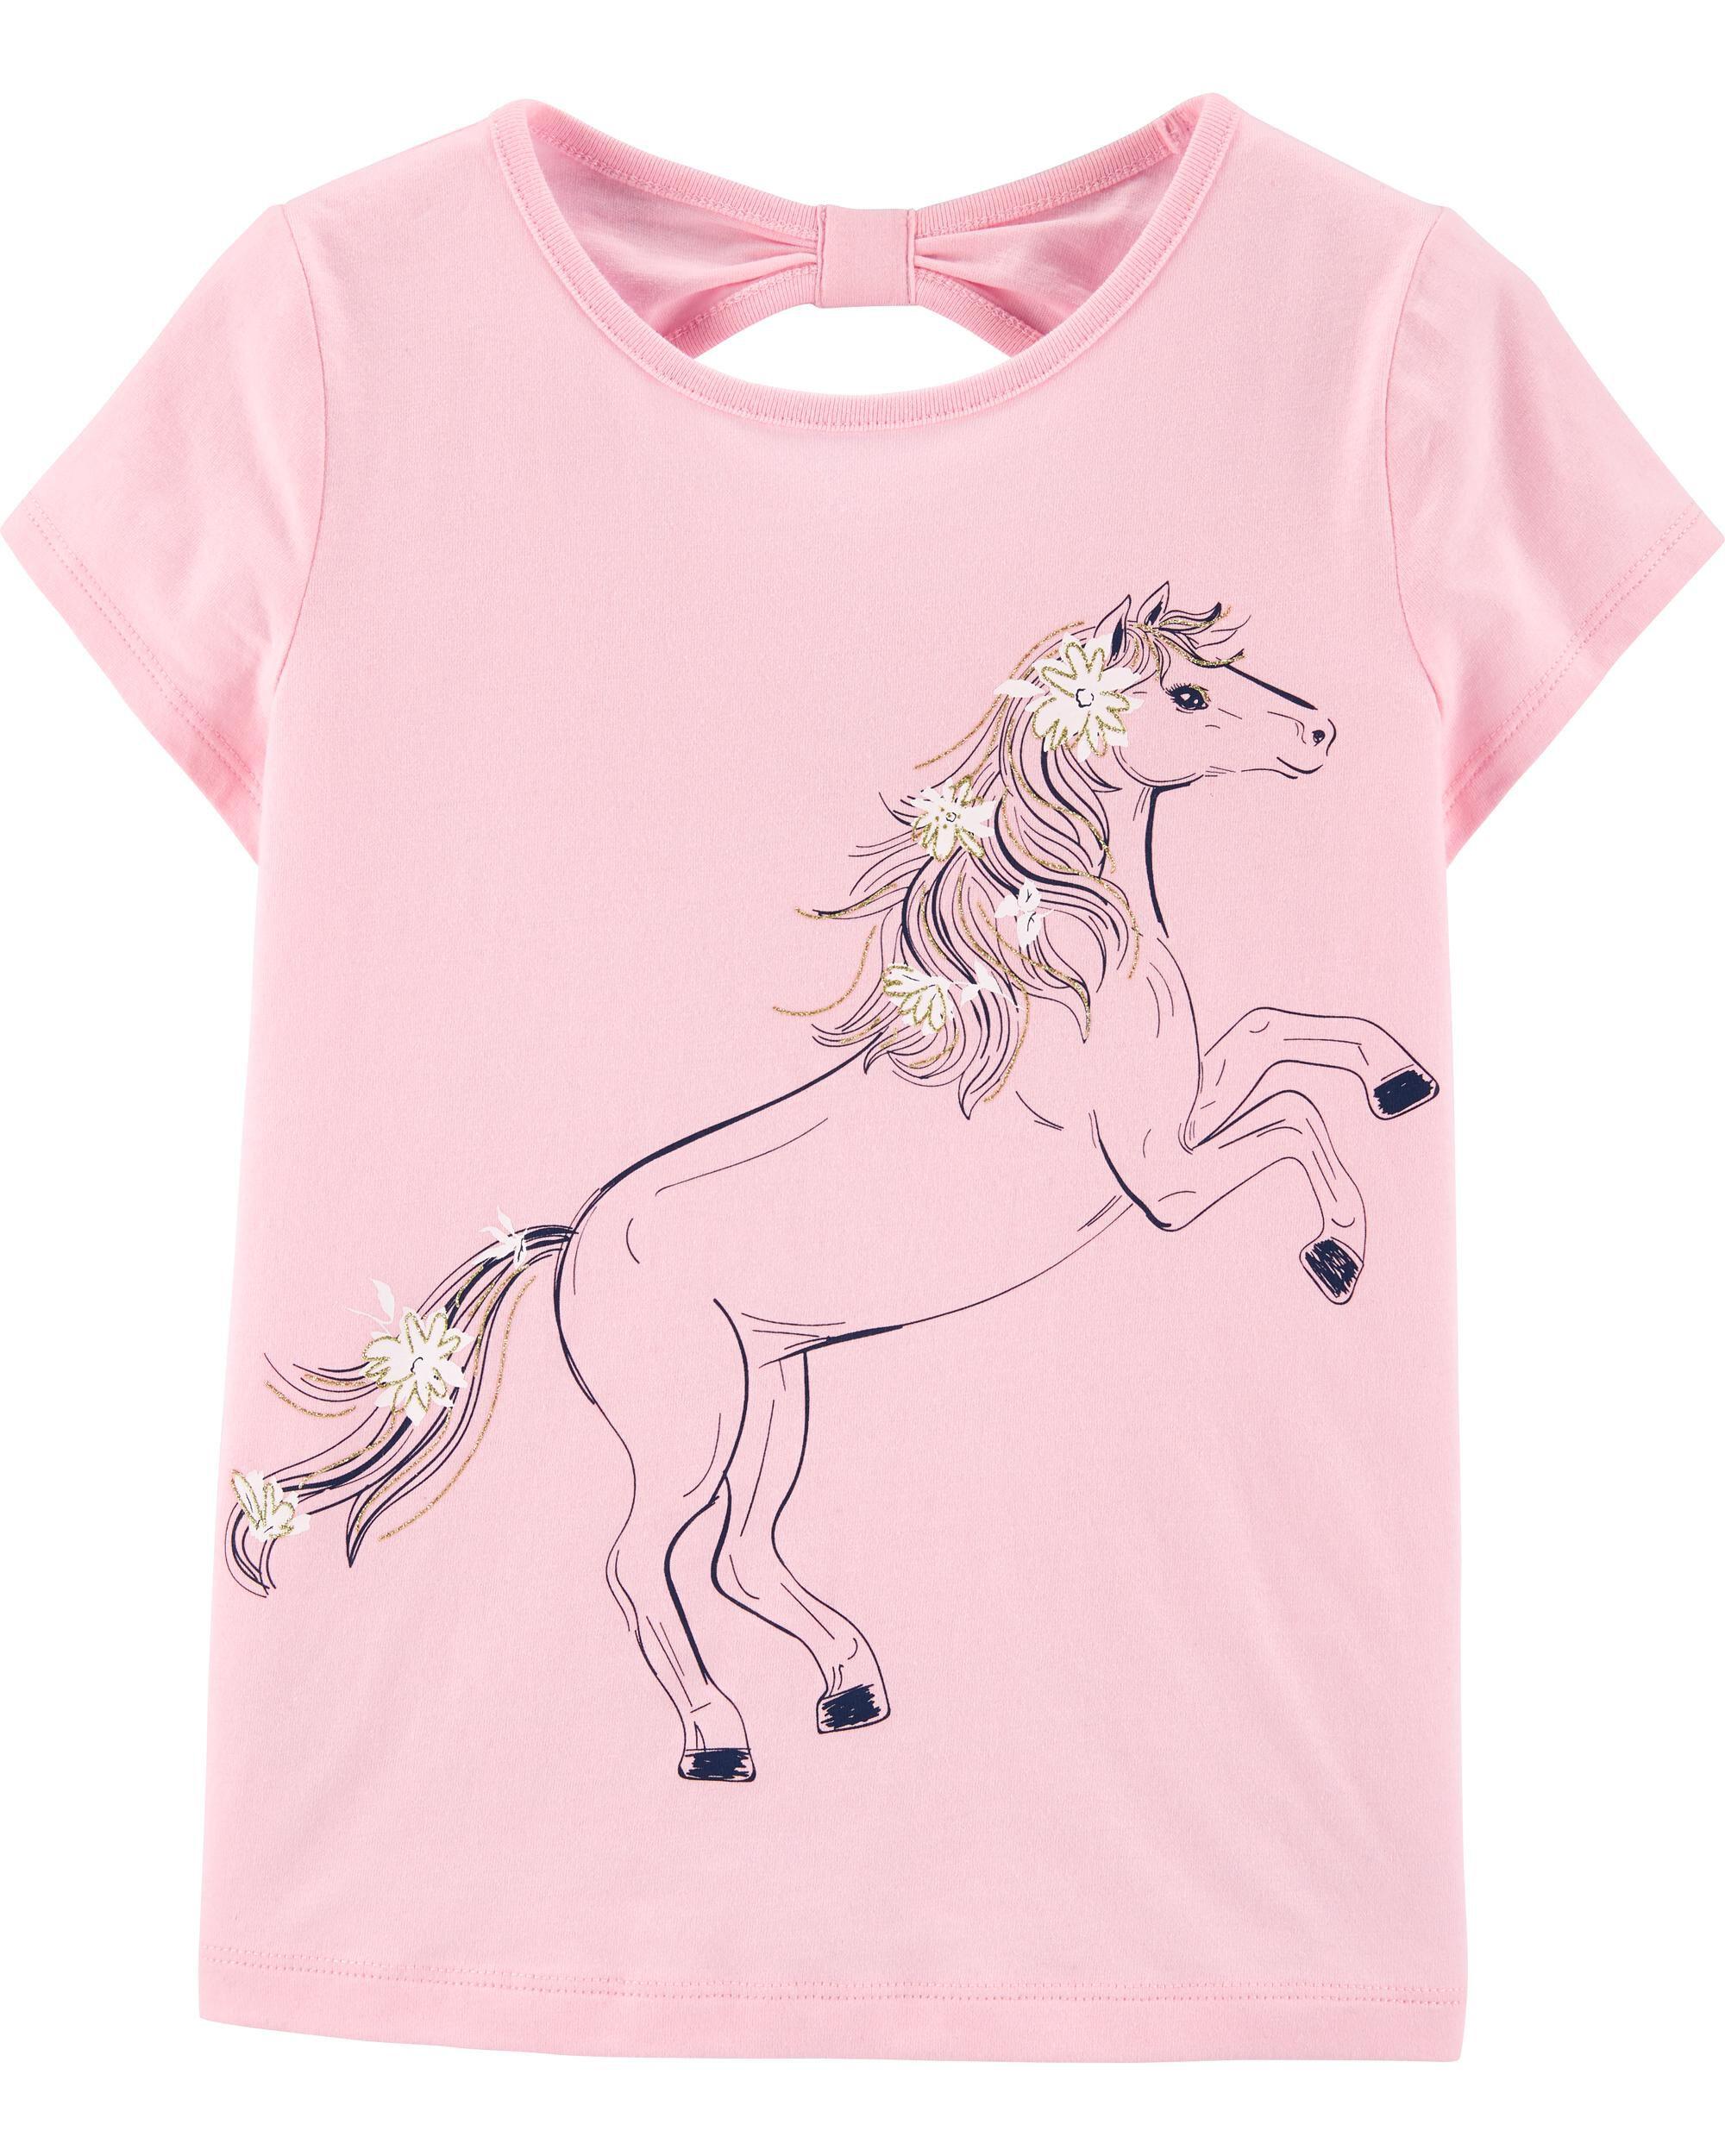 *DOORBUSTER* Glitter Horse Bow Back Jersey Tee